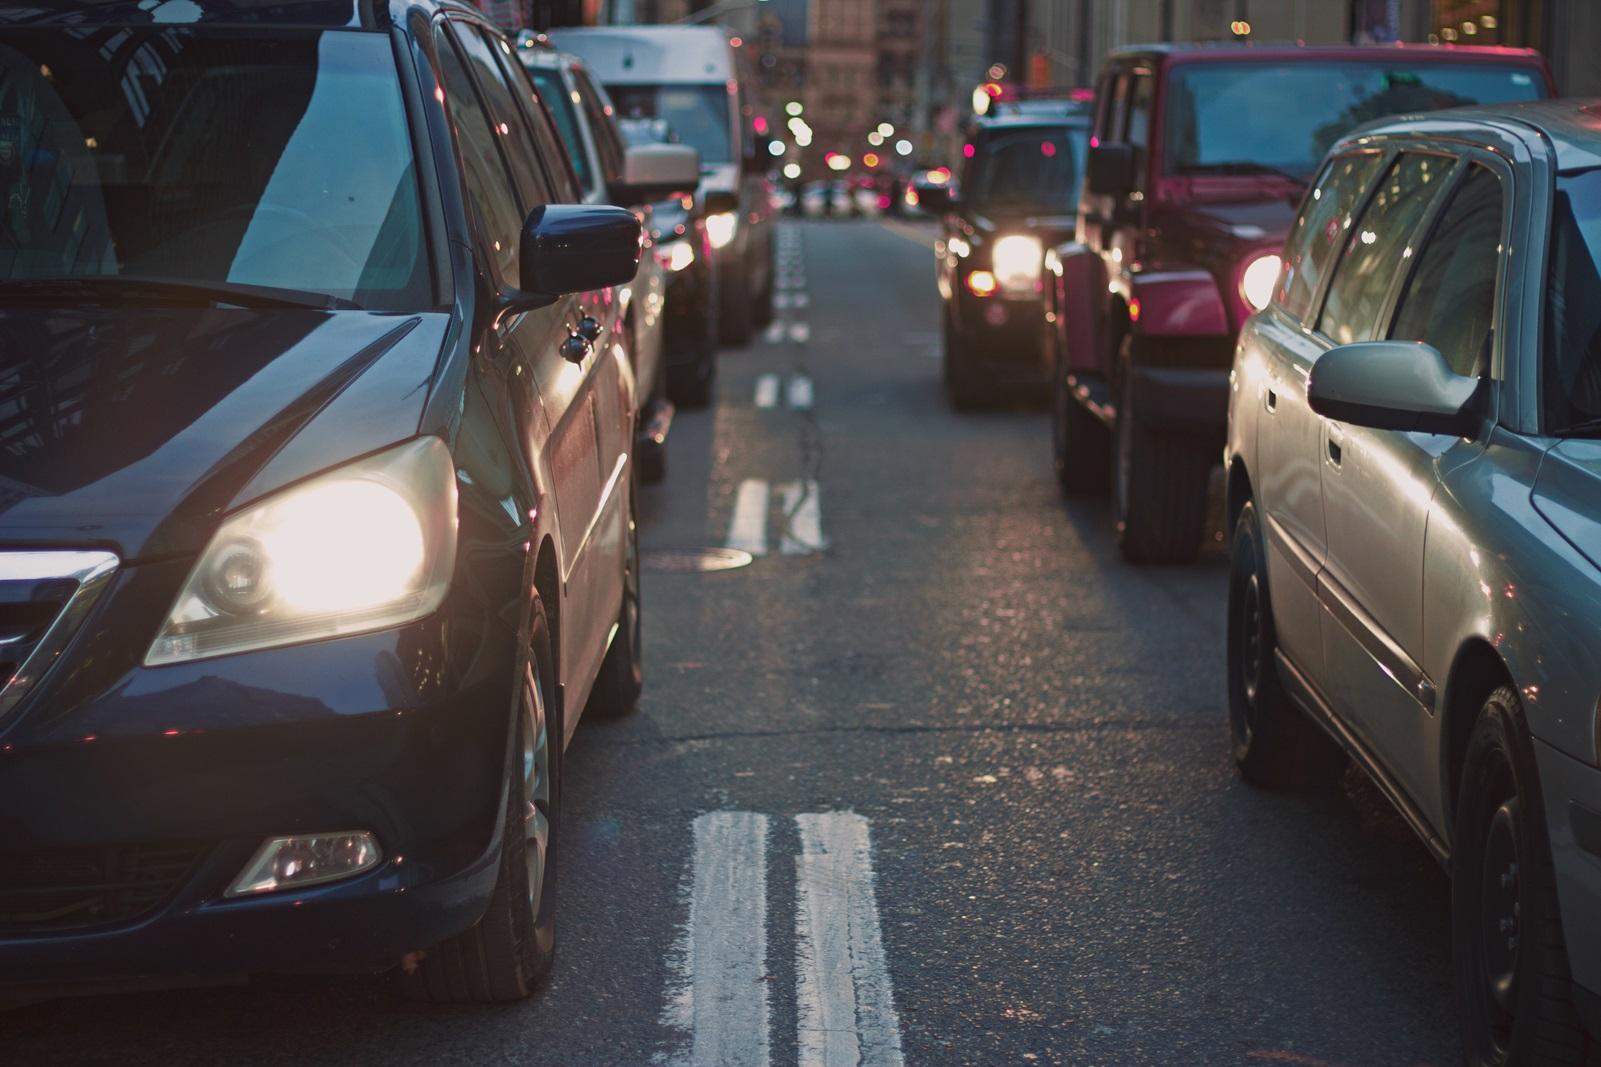 Trafikstøj